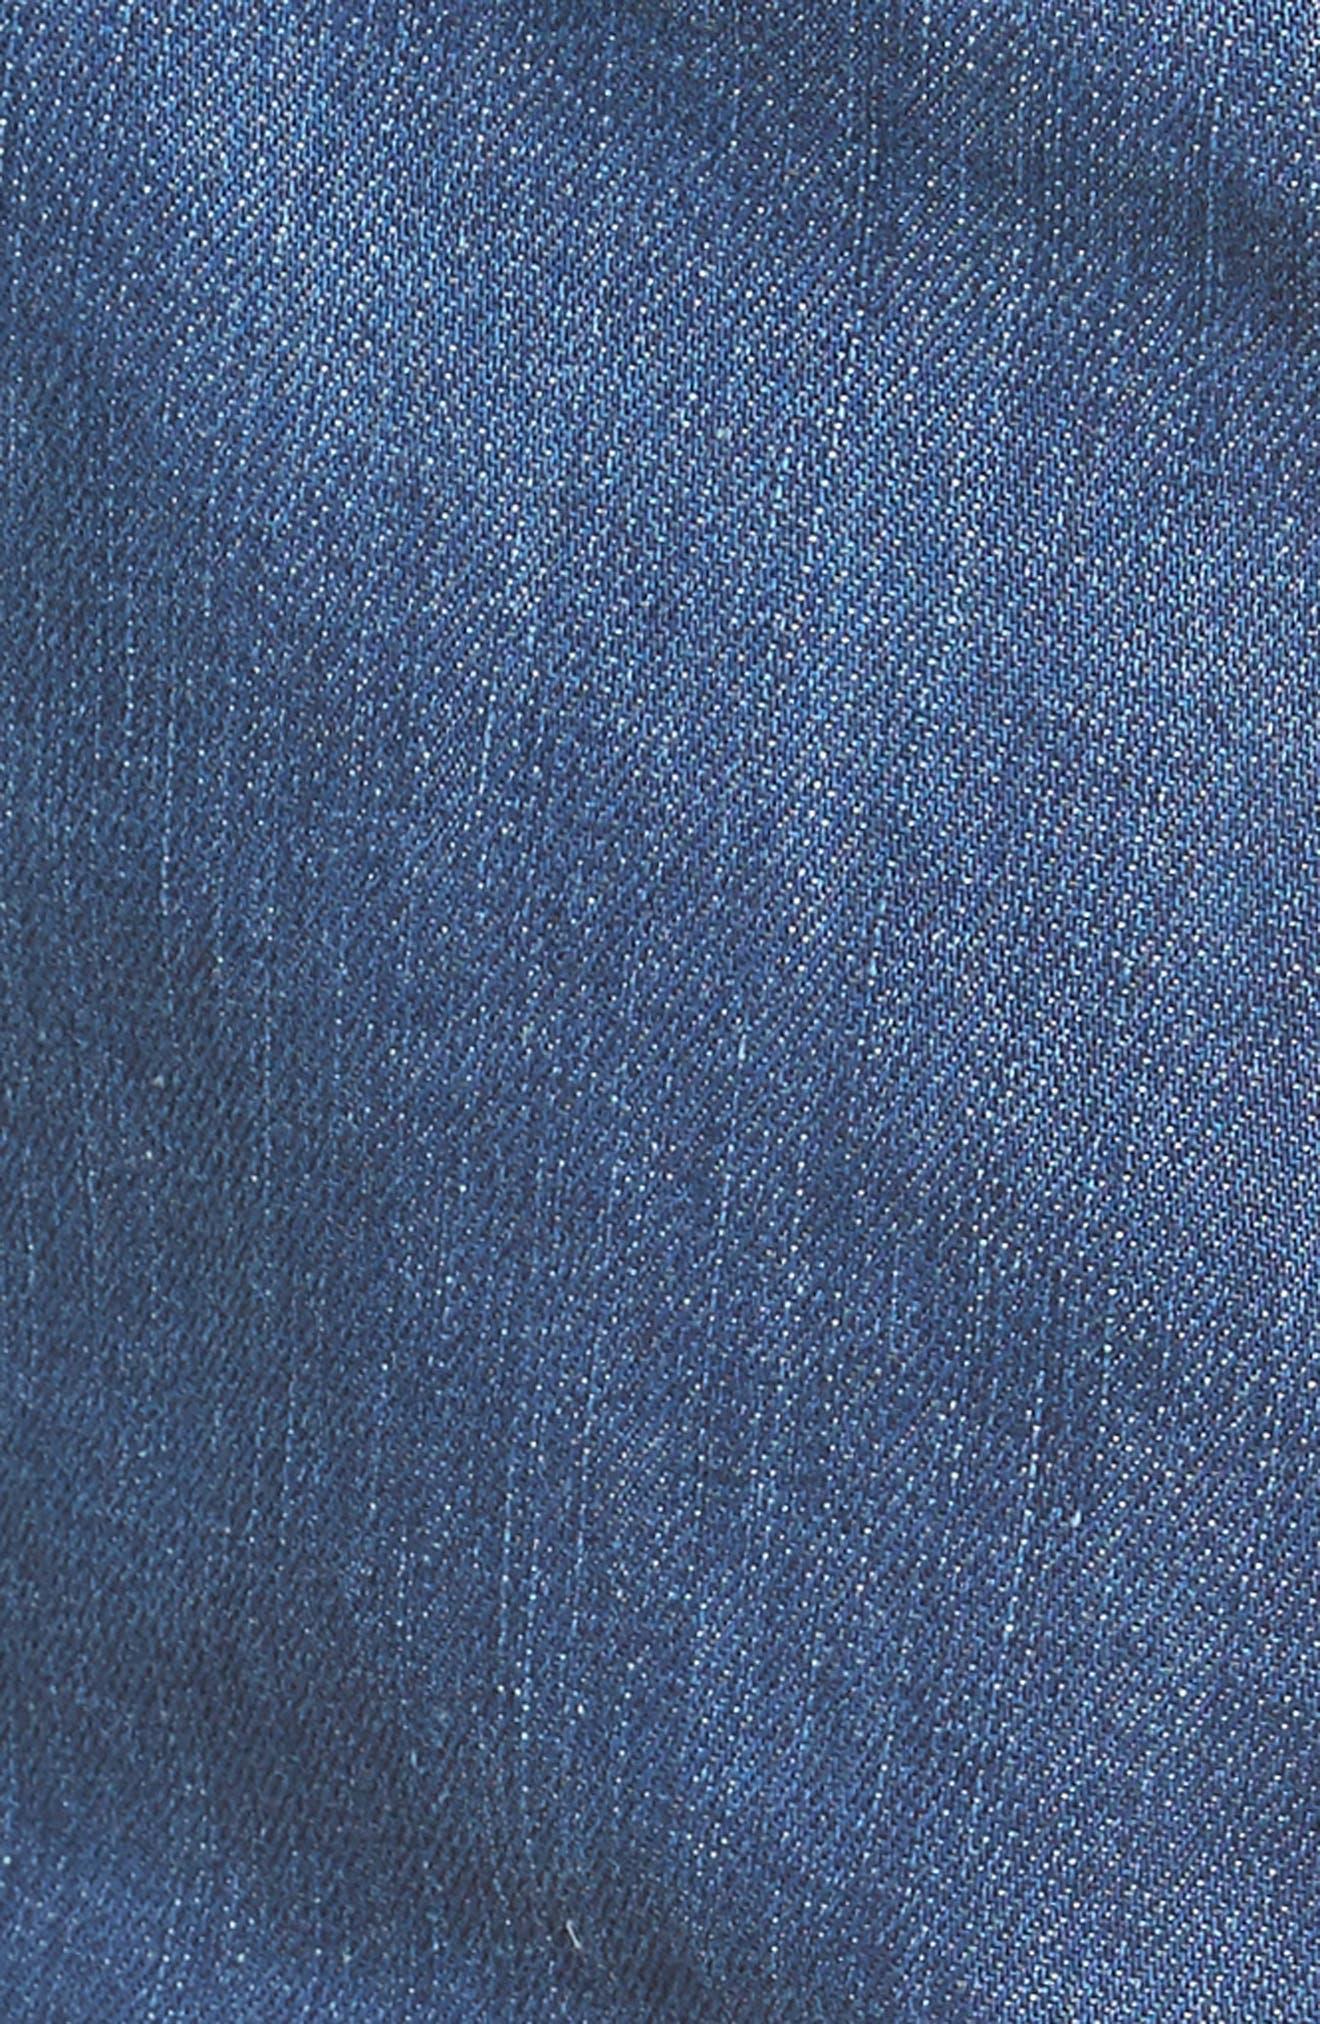 Alternate Image 5  - BLANKNYC Embroidered Denim Shorts (Wild Ones)